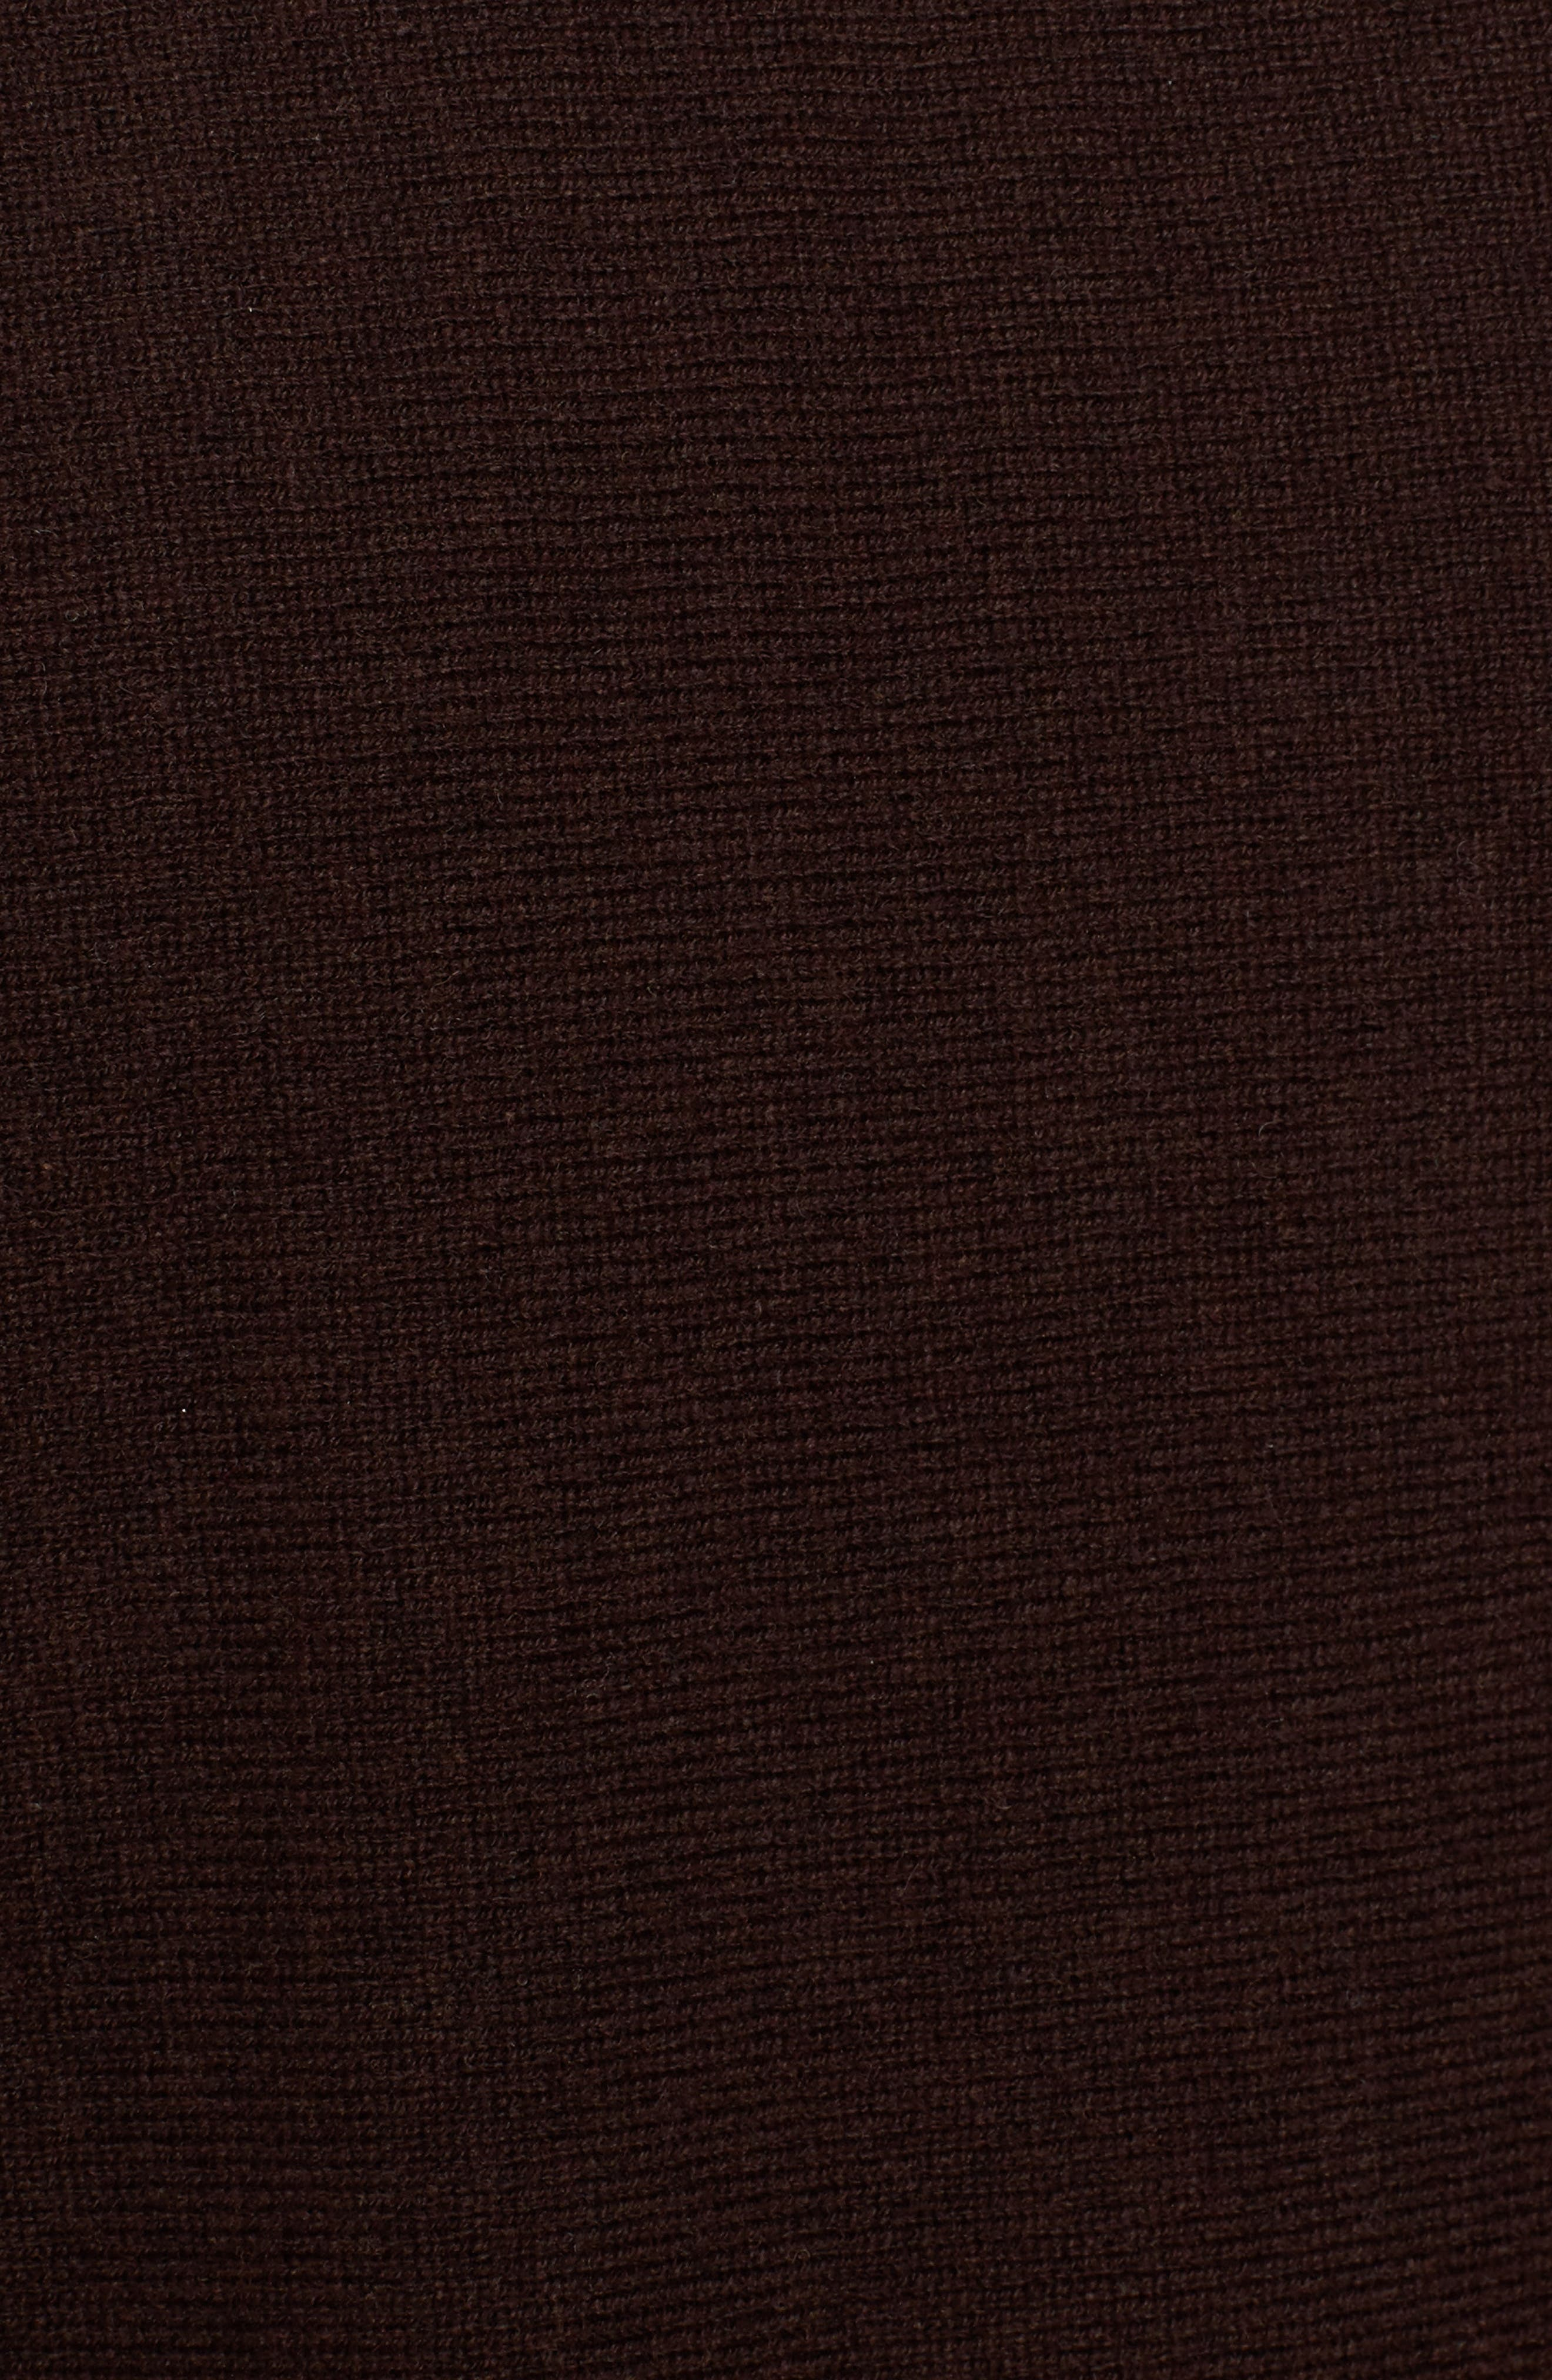 EileenFisher Draped TurtleneckSweater,                             Alternate thumbnail 5, color,                             211